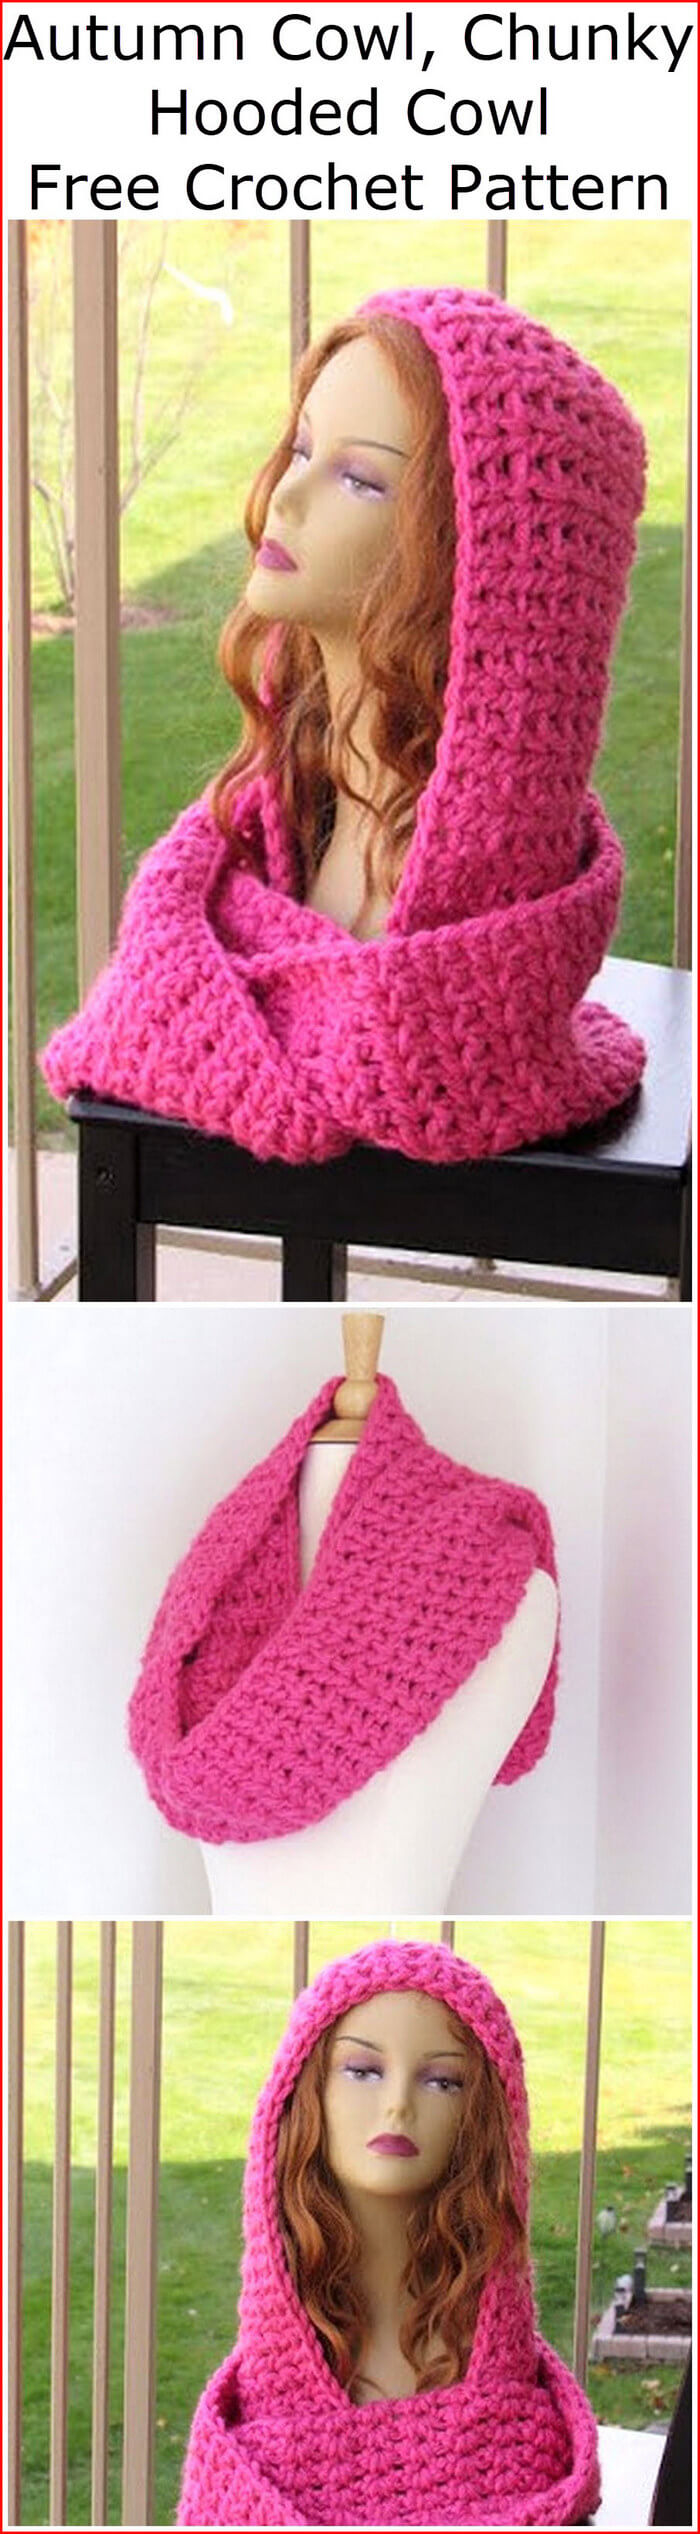 40 Free Patterns For Crochet Cowl Lovers 1001 Crochet